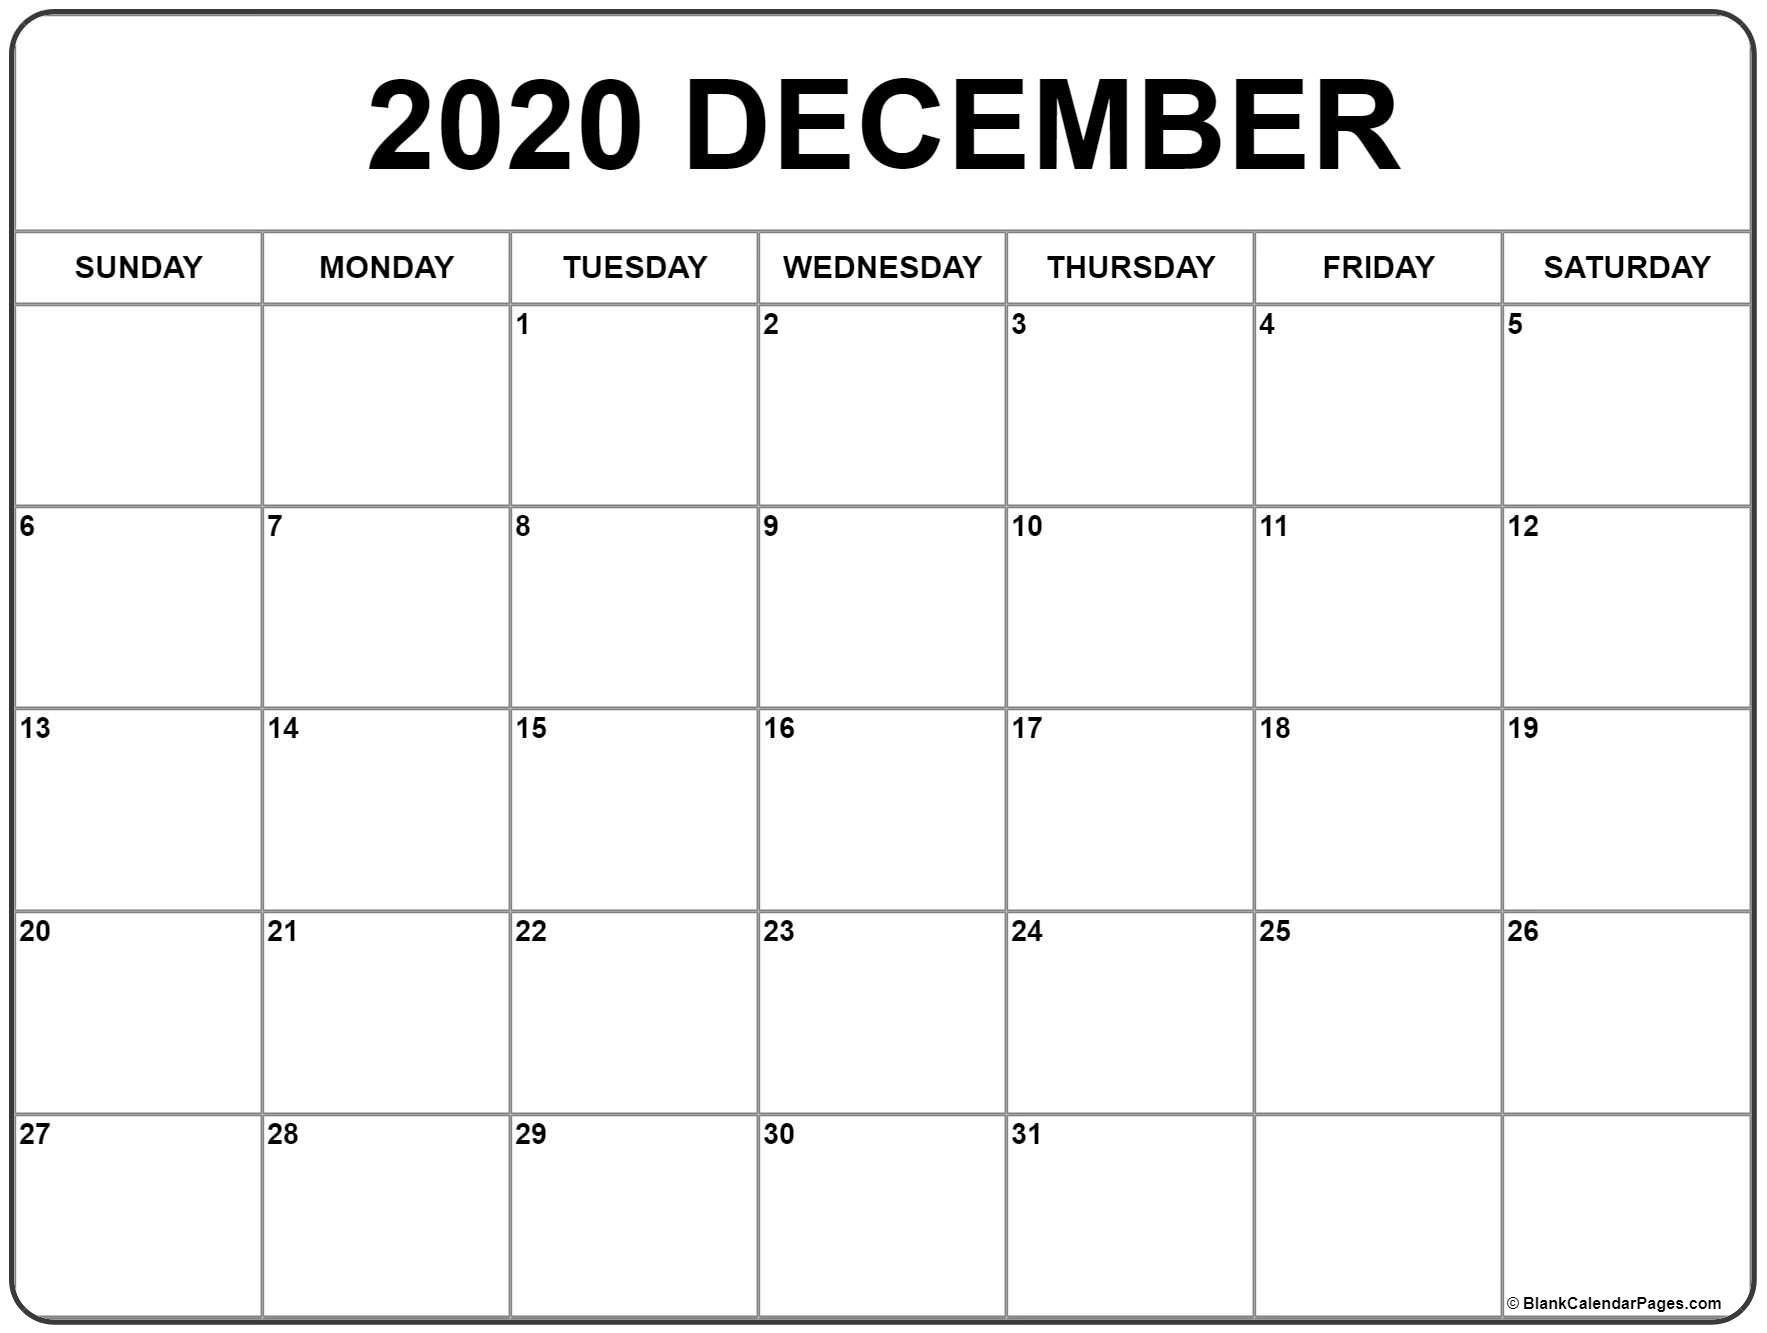 December 2020 Printable Calendar Template #2020Calendars  Full Page Printable 2020 Calendar